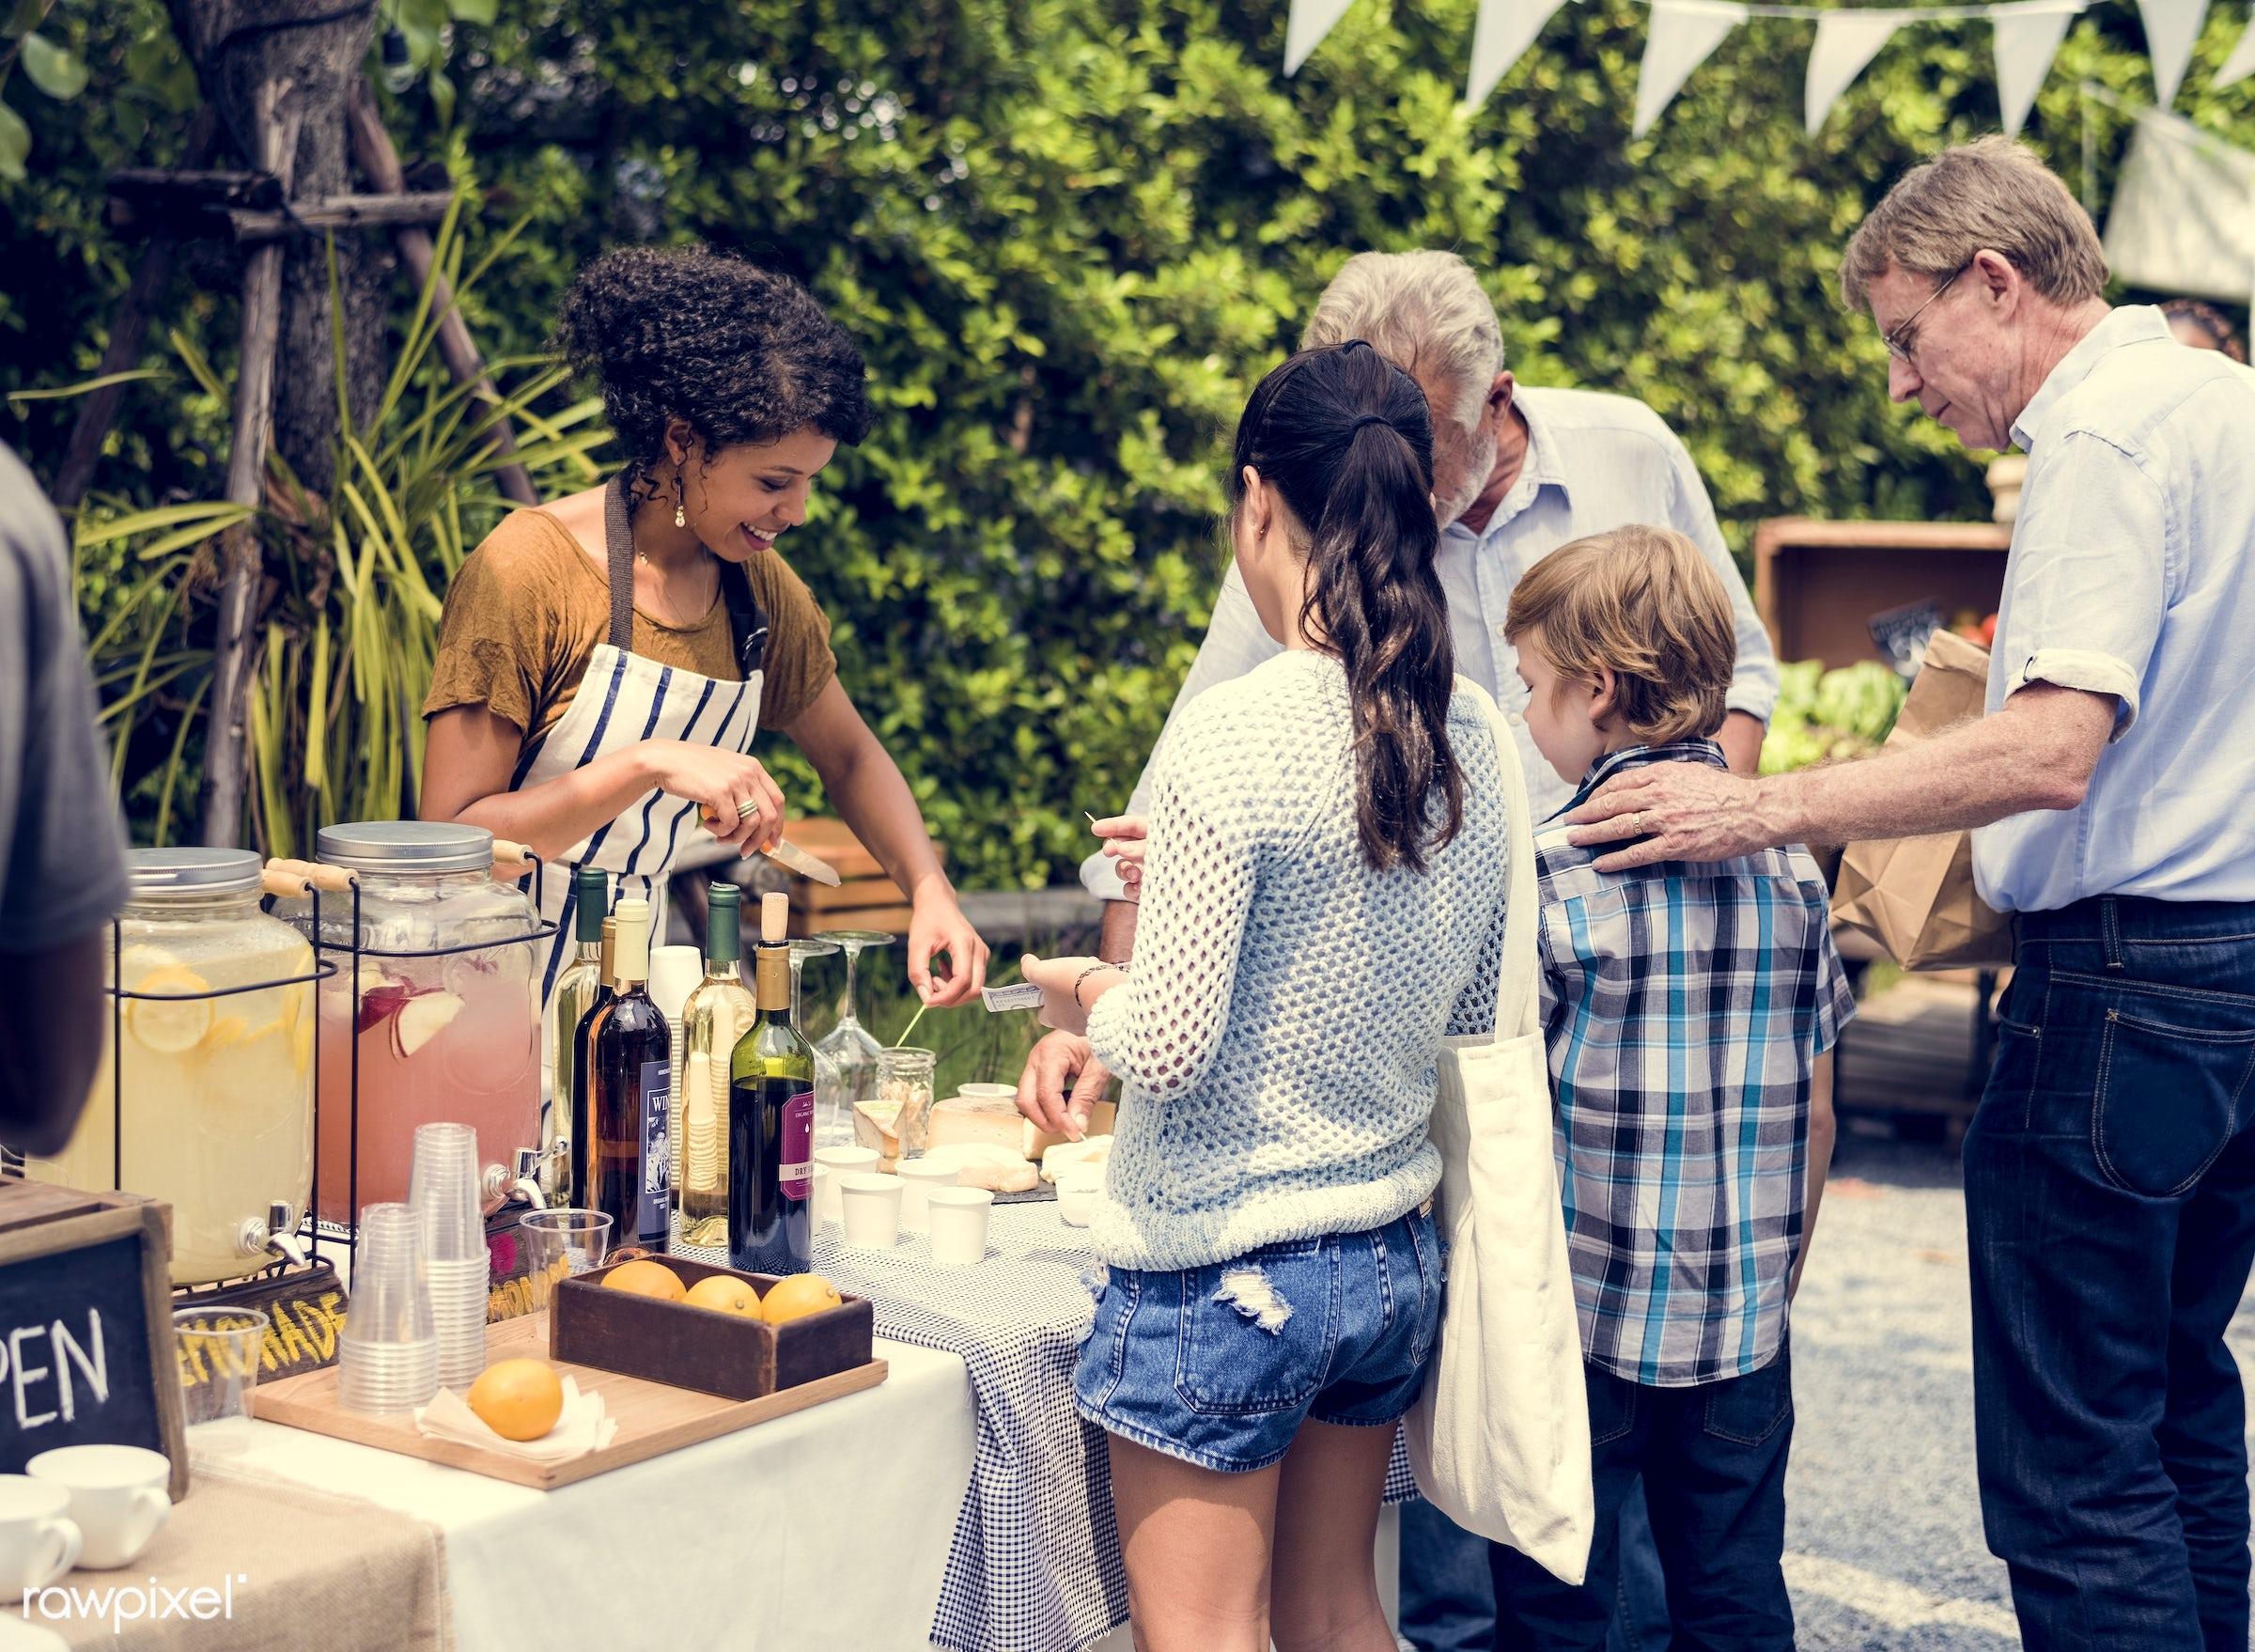 shop, nutritious, customer, drinks, people, farmer, fresh, jar, juice, lemonade, juice stand, tank, refresh, fruit, selling...